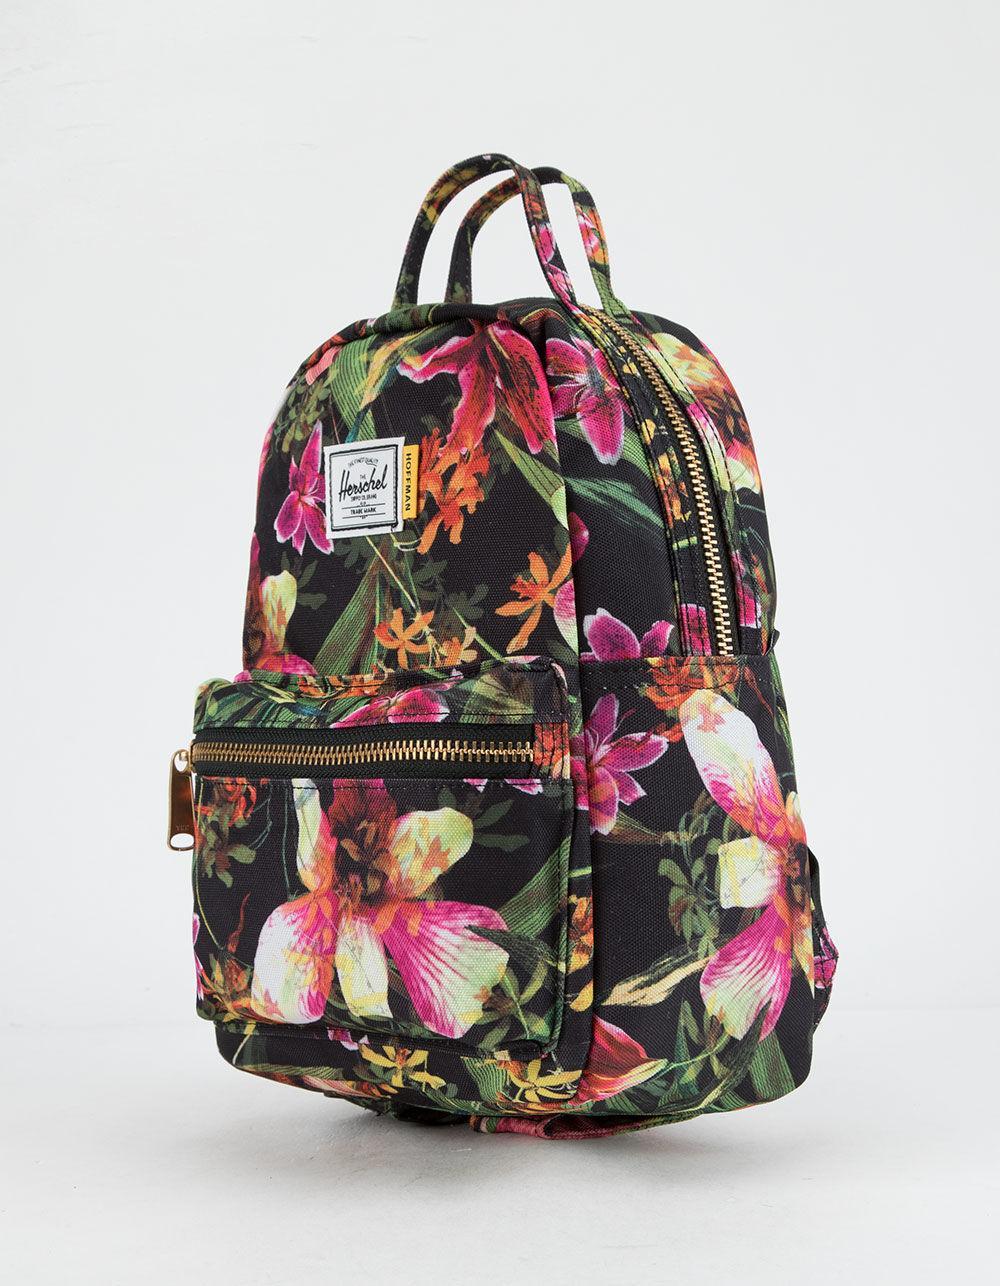 e0b90126b9186 Lyst - Herschel Supply Co. Nova Jungle Hoffman Mini Backpack